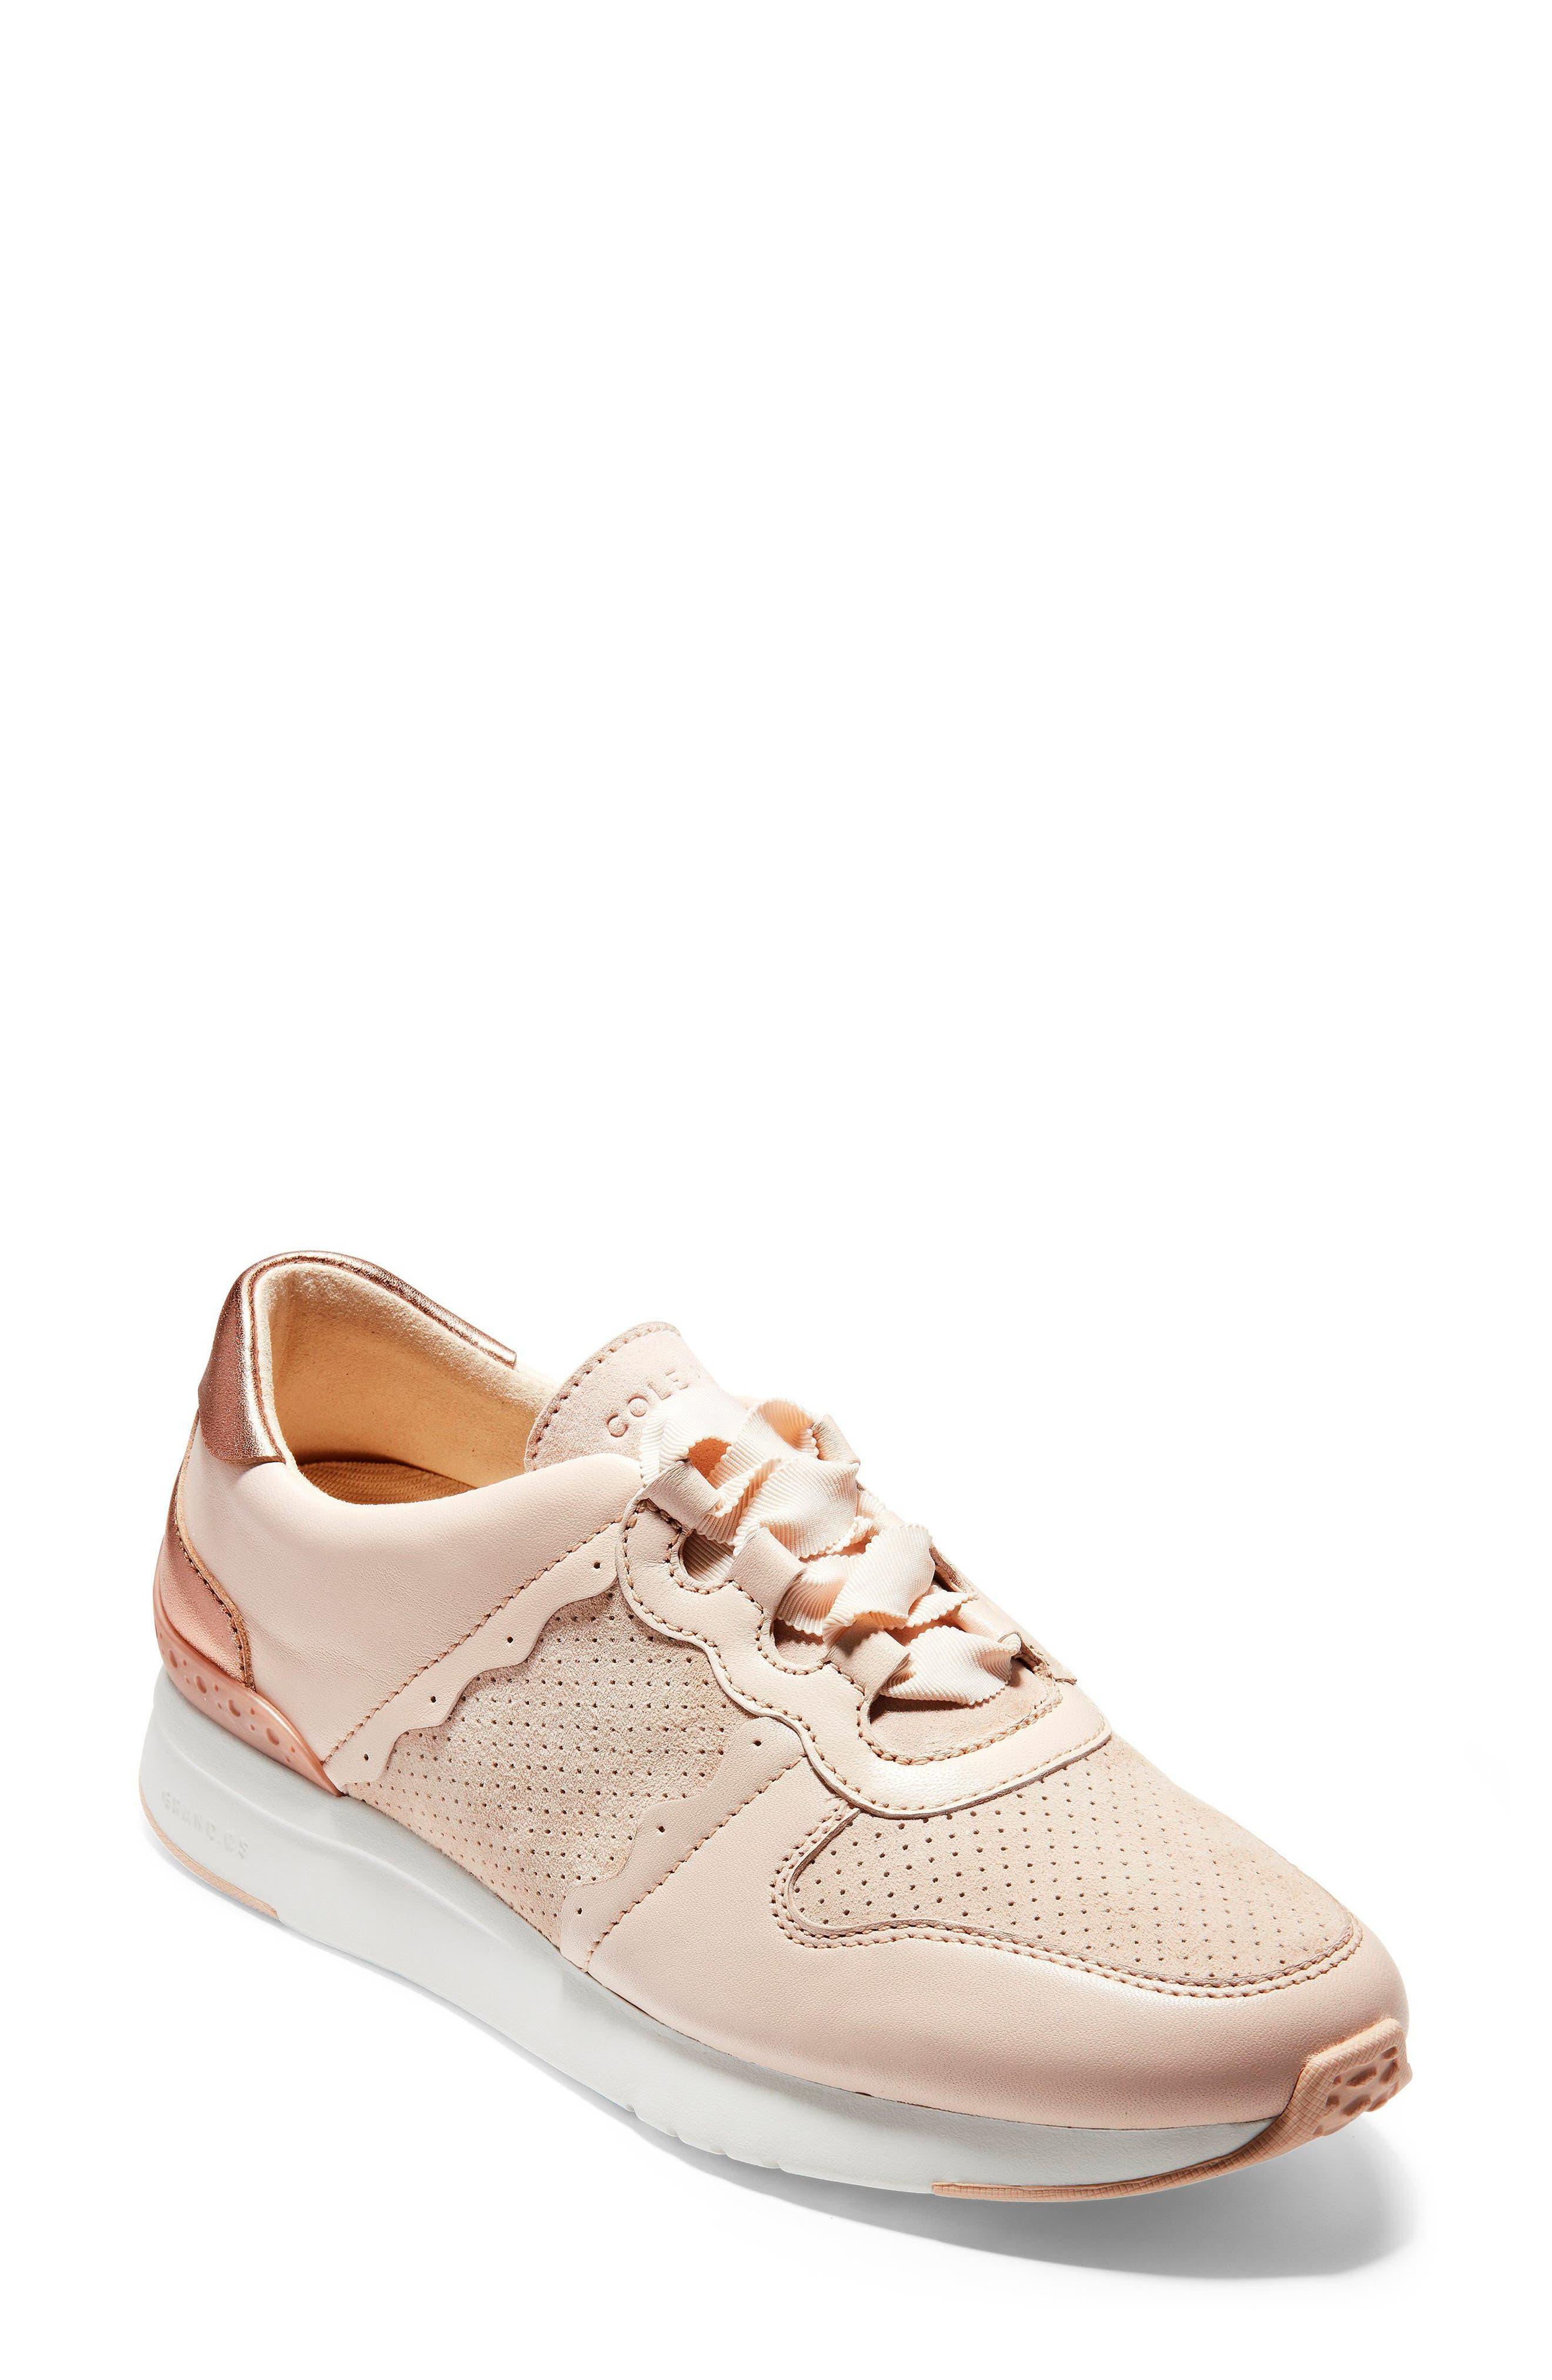 GrandPro Wedge Sneaker,                             Main thumbnail 1, color,                             Peach Blush Suede